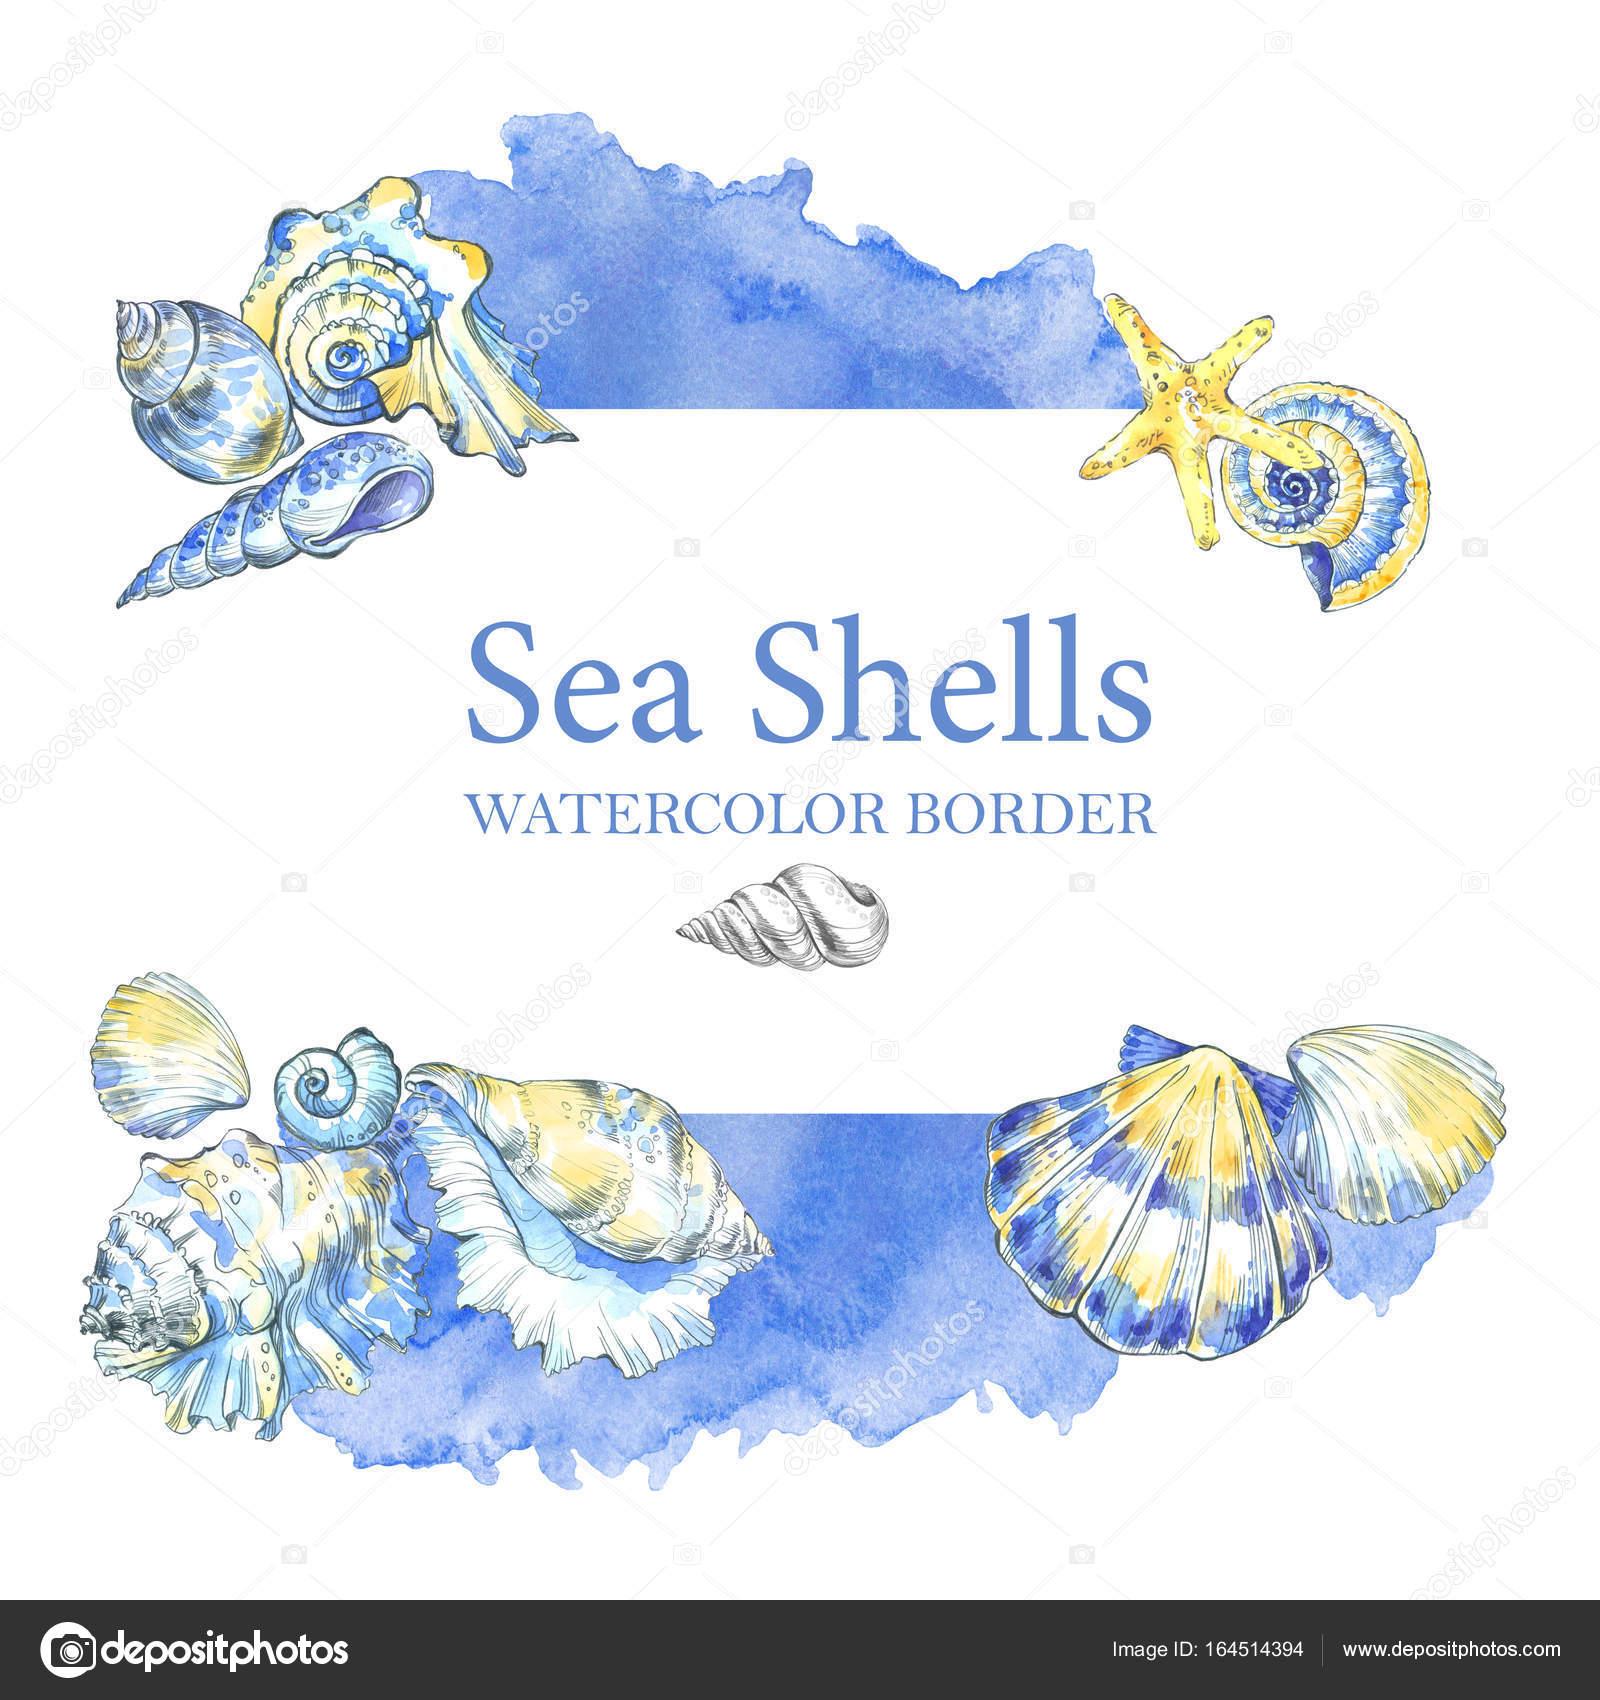 Hand Painted Seashells Border Watercolor Decorative